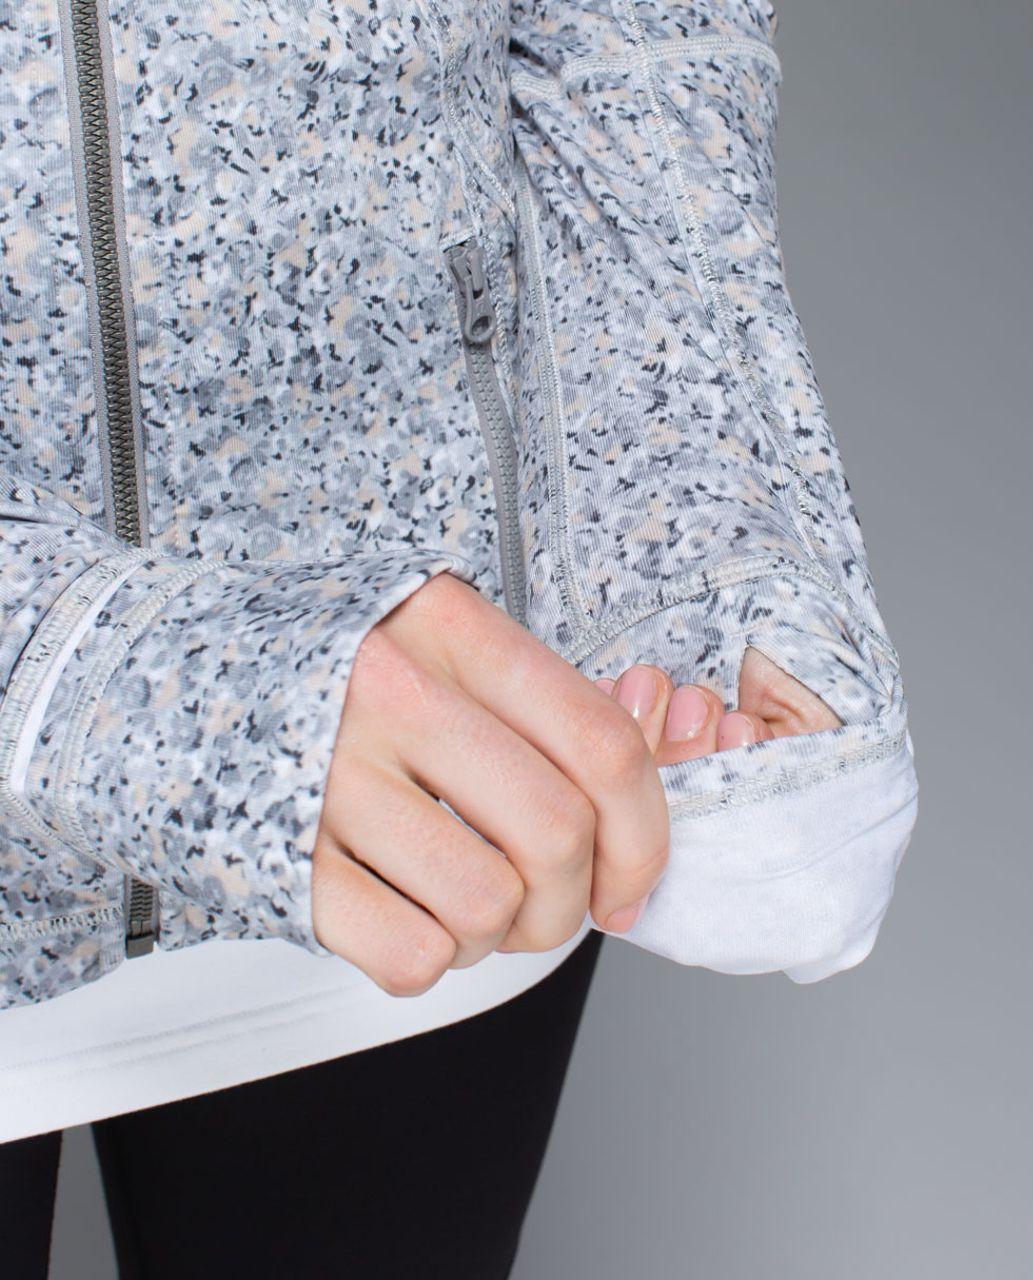 Lululemon Forme Jacket *Cuffins - Petite Fleur Silver Spoon